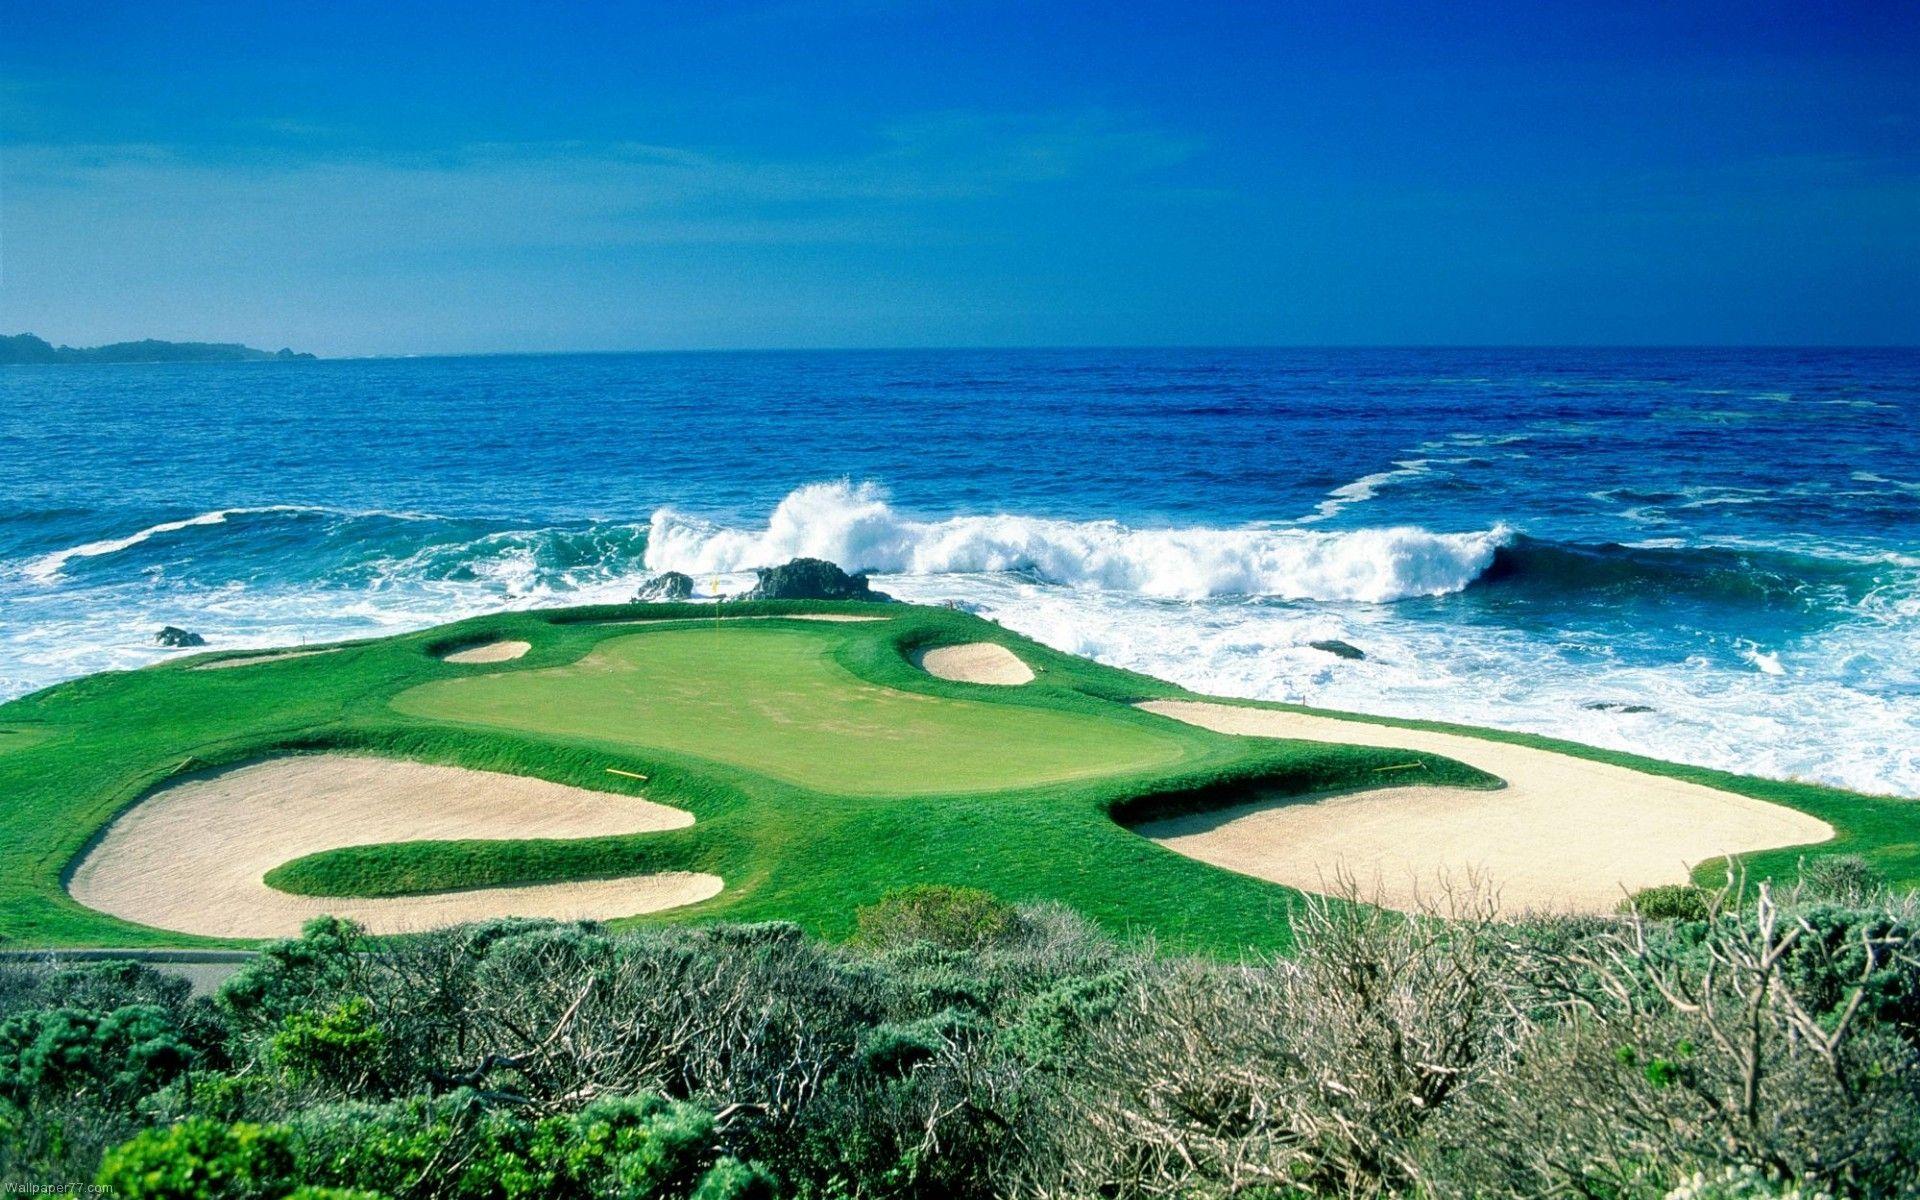 photos of golf